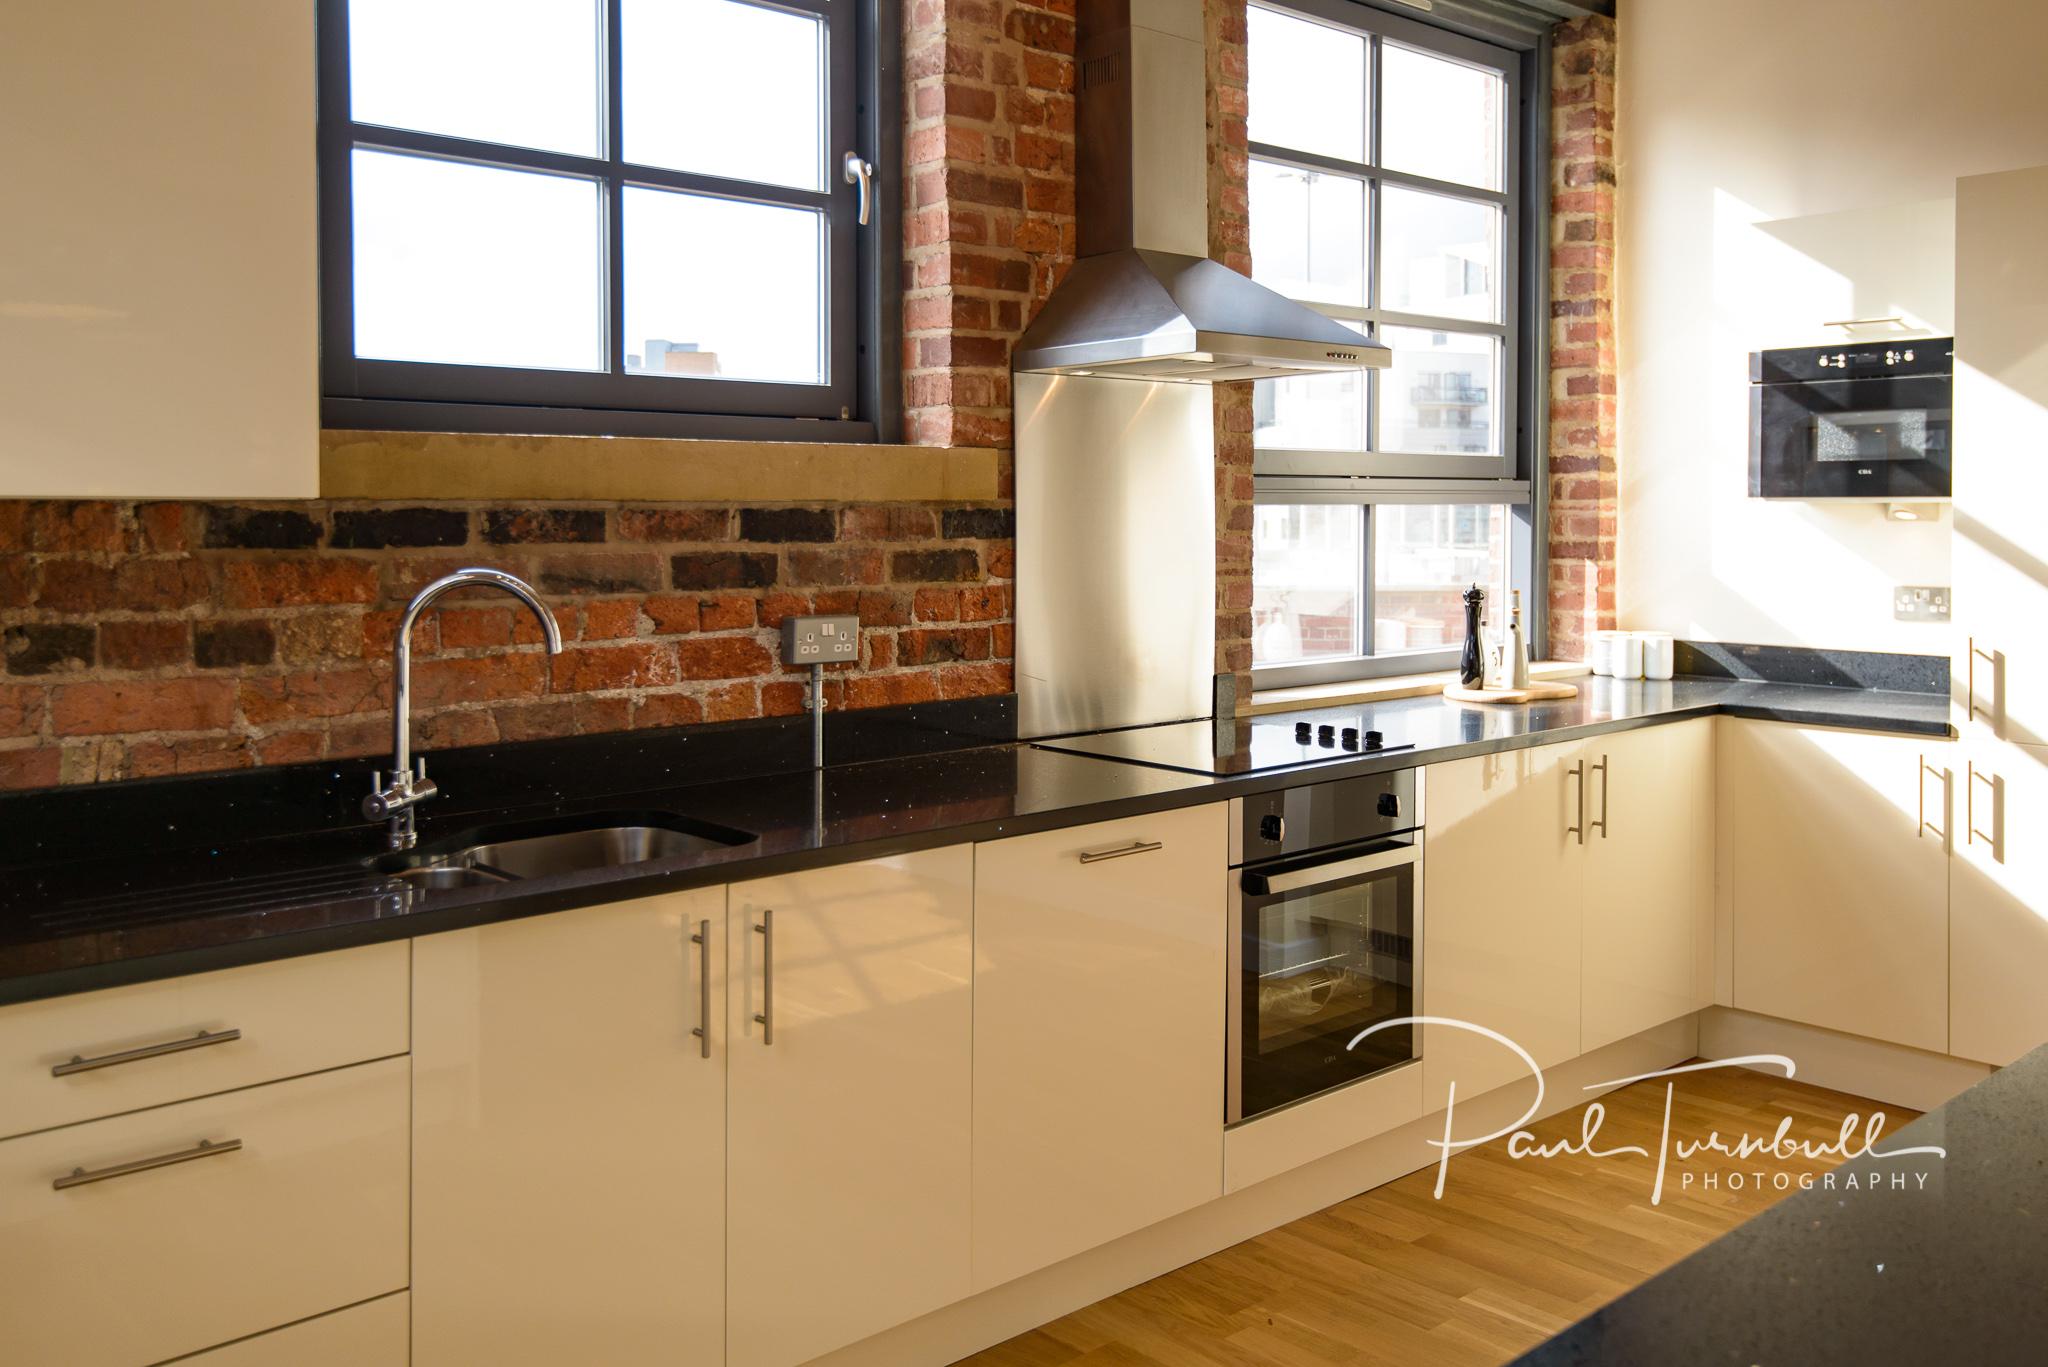 commercial-property-photographer-leeds-yorkshire-blackbrook-developments-016.jpg